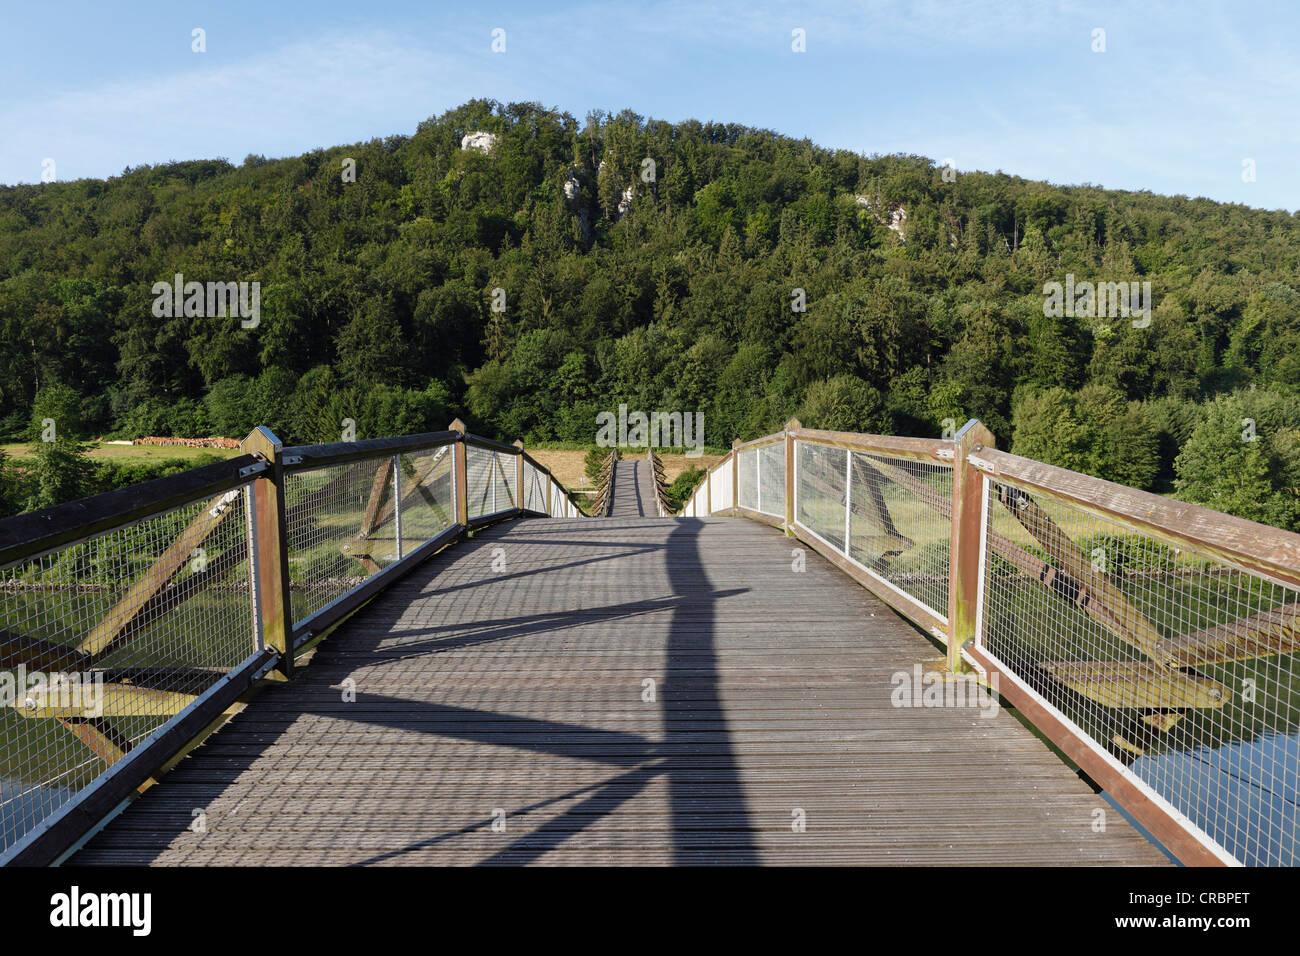 'Tatzelwurm' wooden bridge over the Altmuehl river, Altmuehl Valley, Lower Bavaria, Bavaria, Germany, Europe - Stock Image